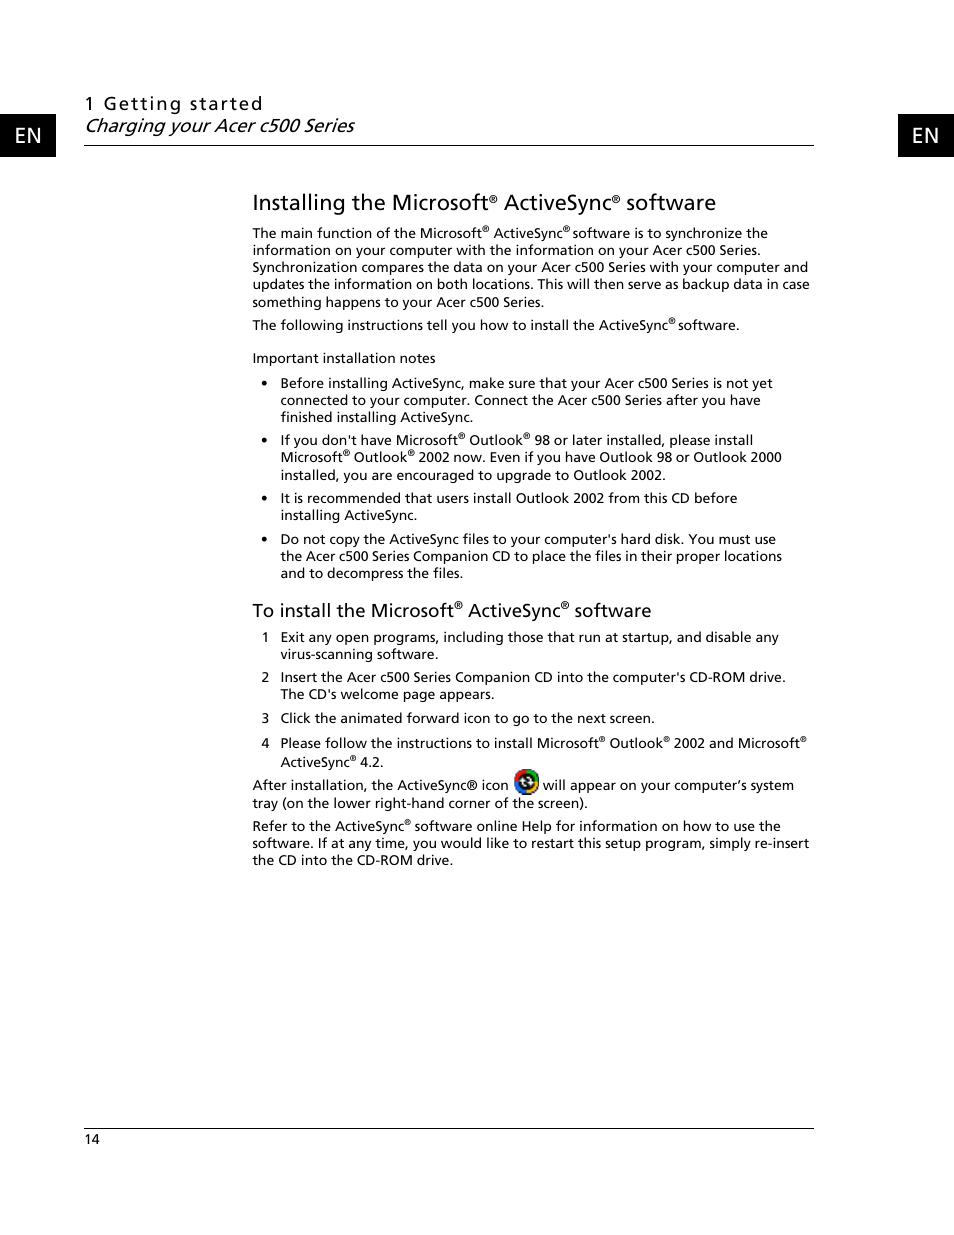 acer c500 manual open source user manual u2022 rh dramatic varieties com Acer Tablet Manual Acer Service Manual